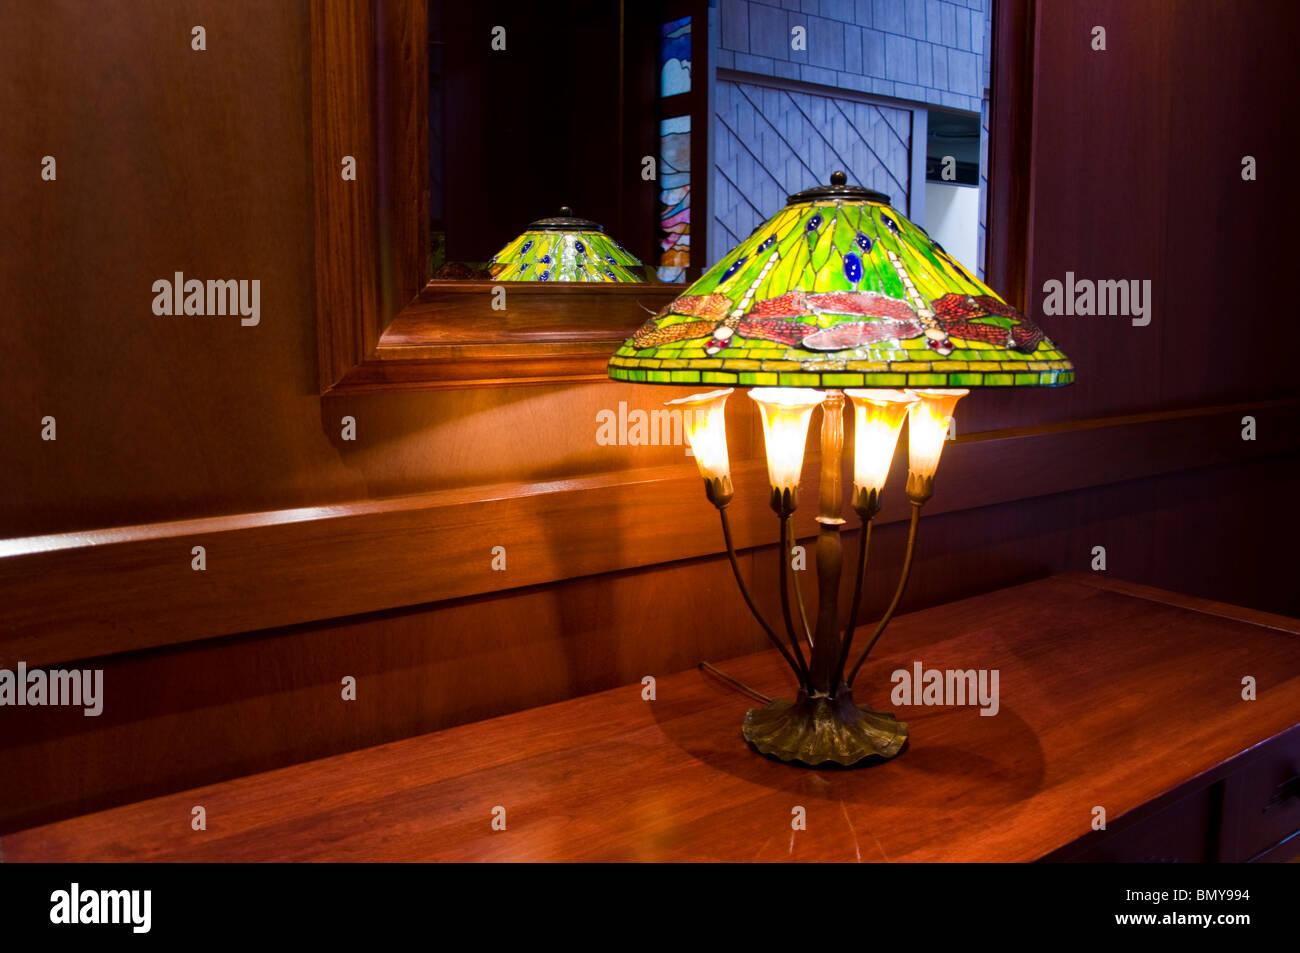 Tiffany Lampen Amsterdam : Tiffany lampe stockfotos tiffany lampe bilder alamy